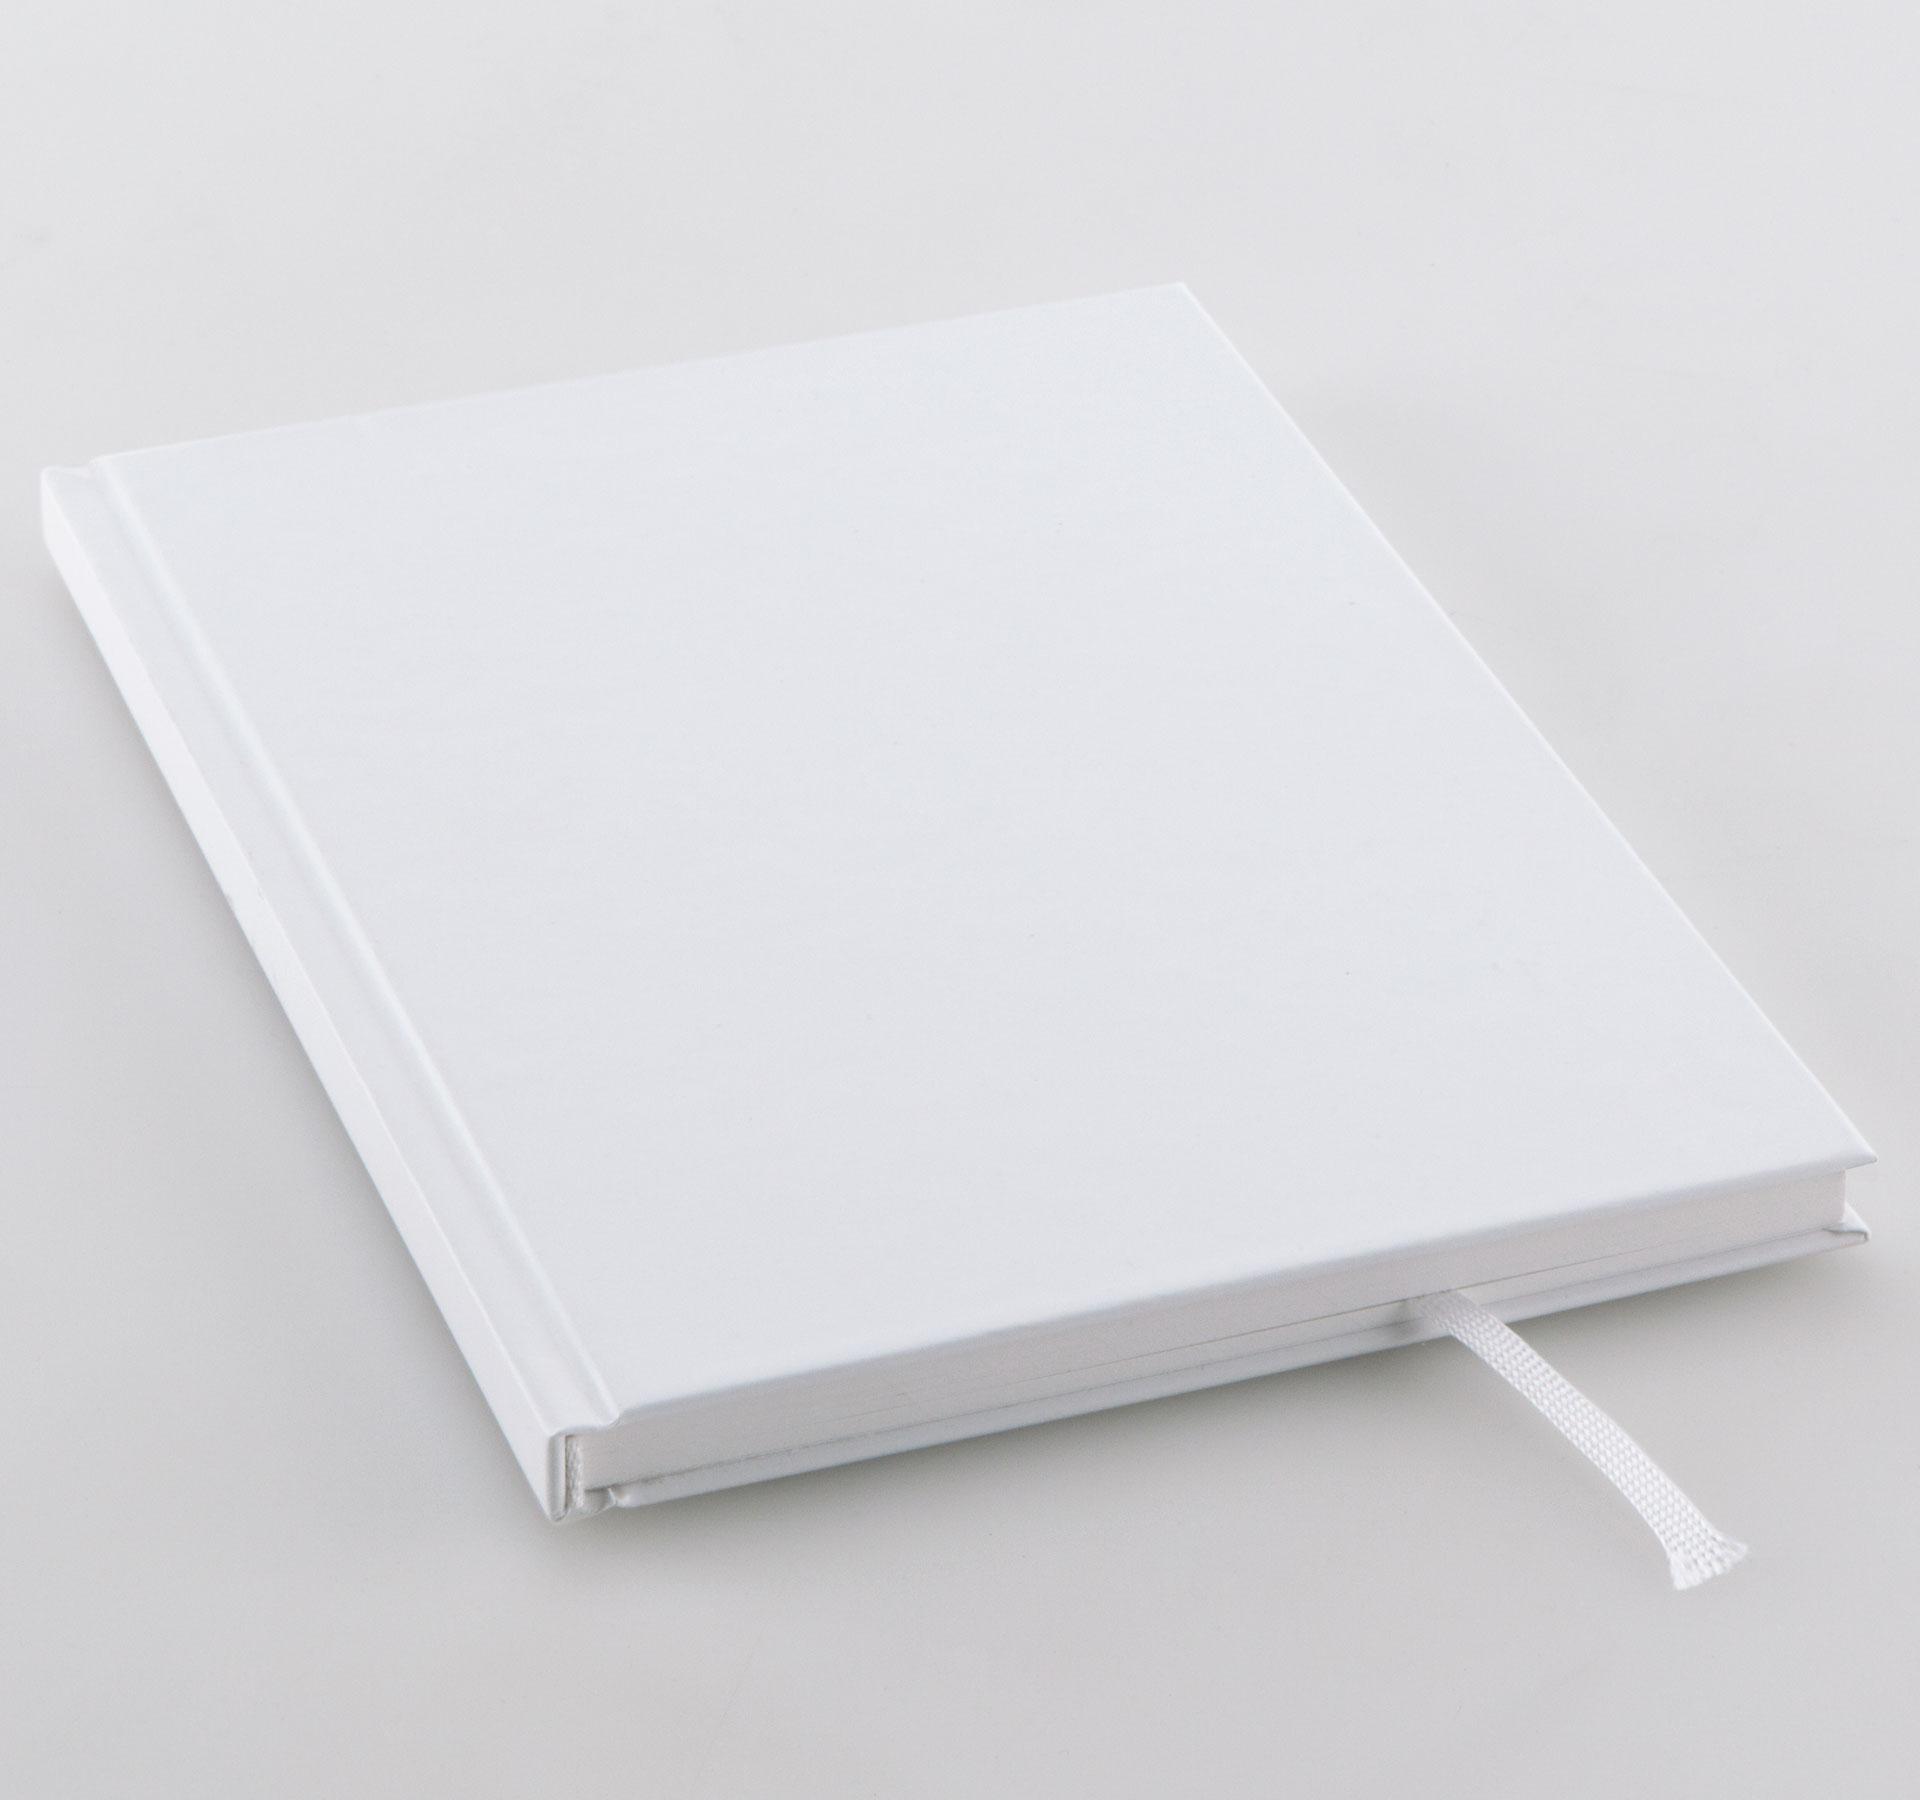 Hardcover mit Kapitalband und Leseband